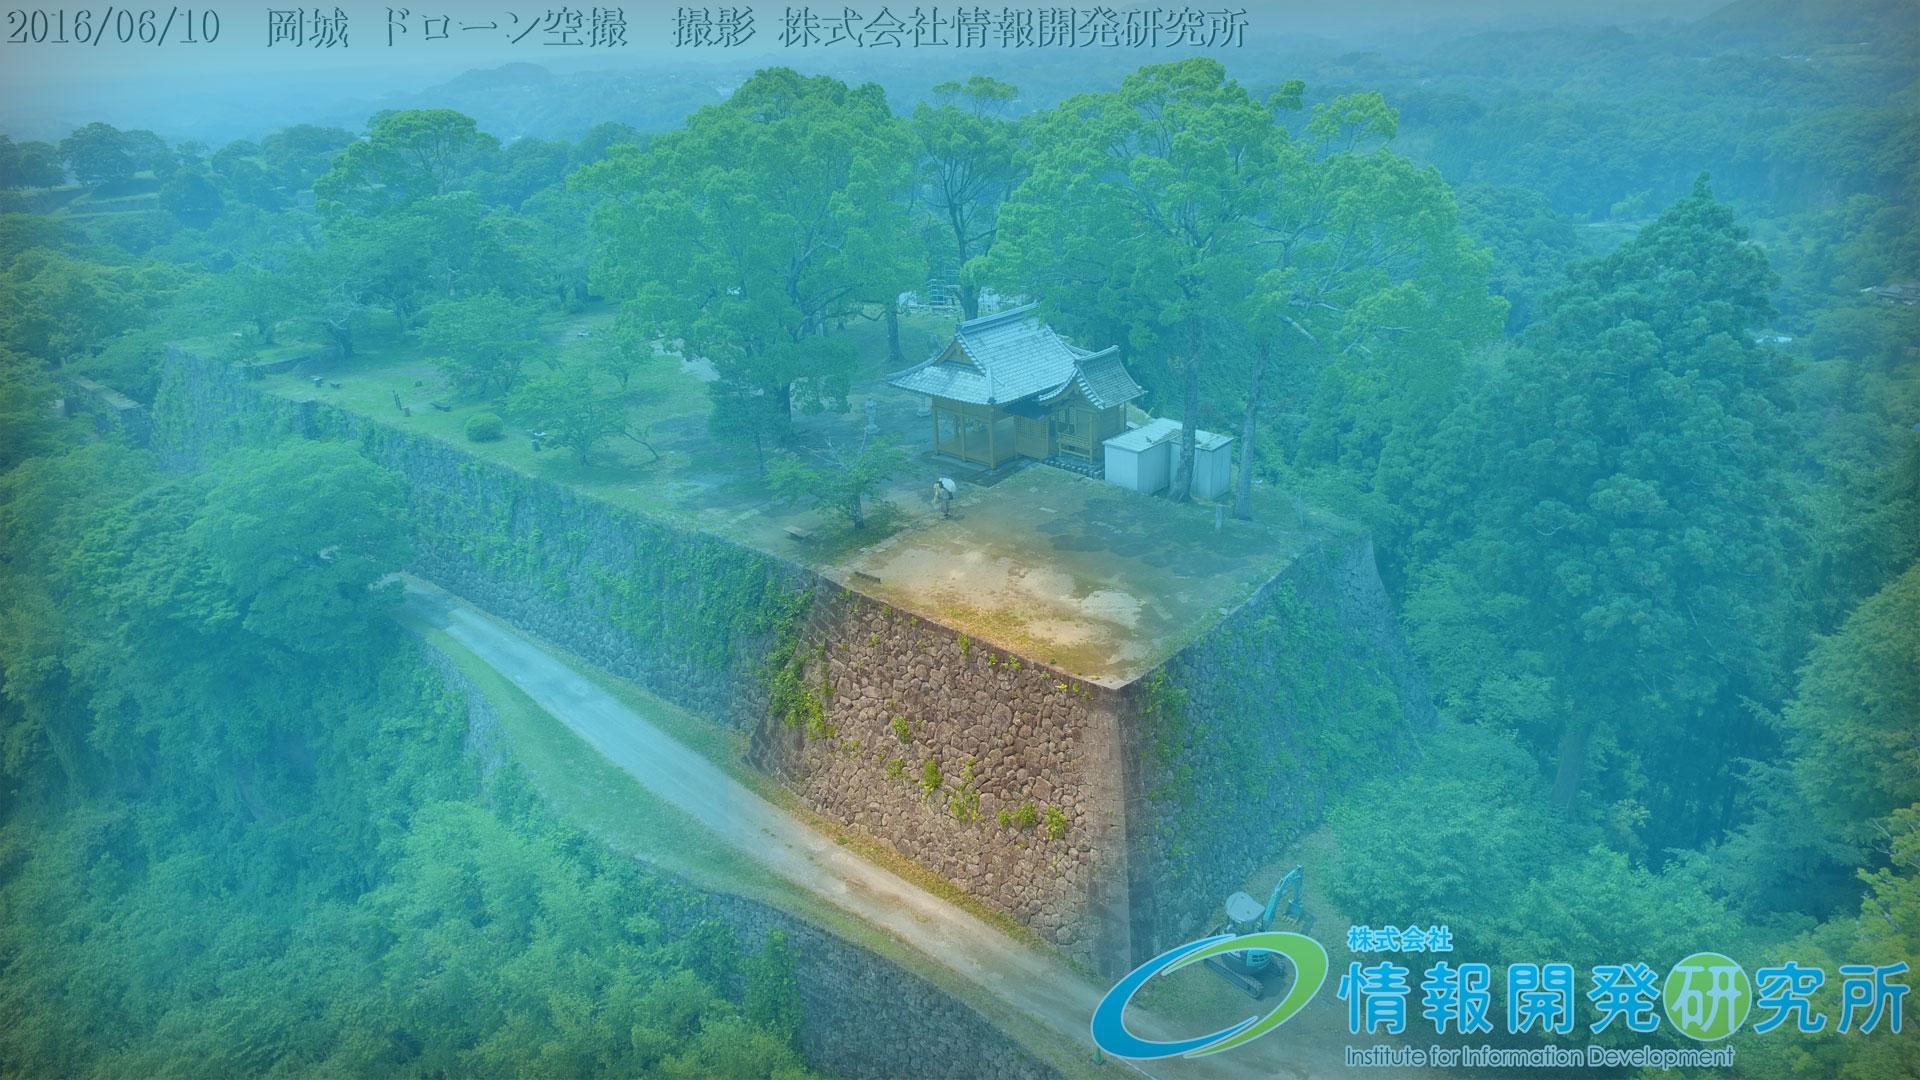 「車軸築」 岡城本丸の石垣kuruma